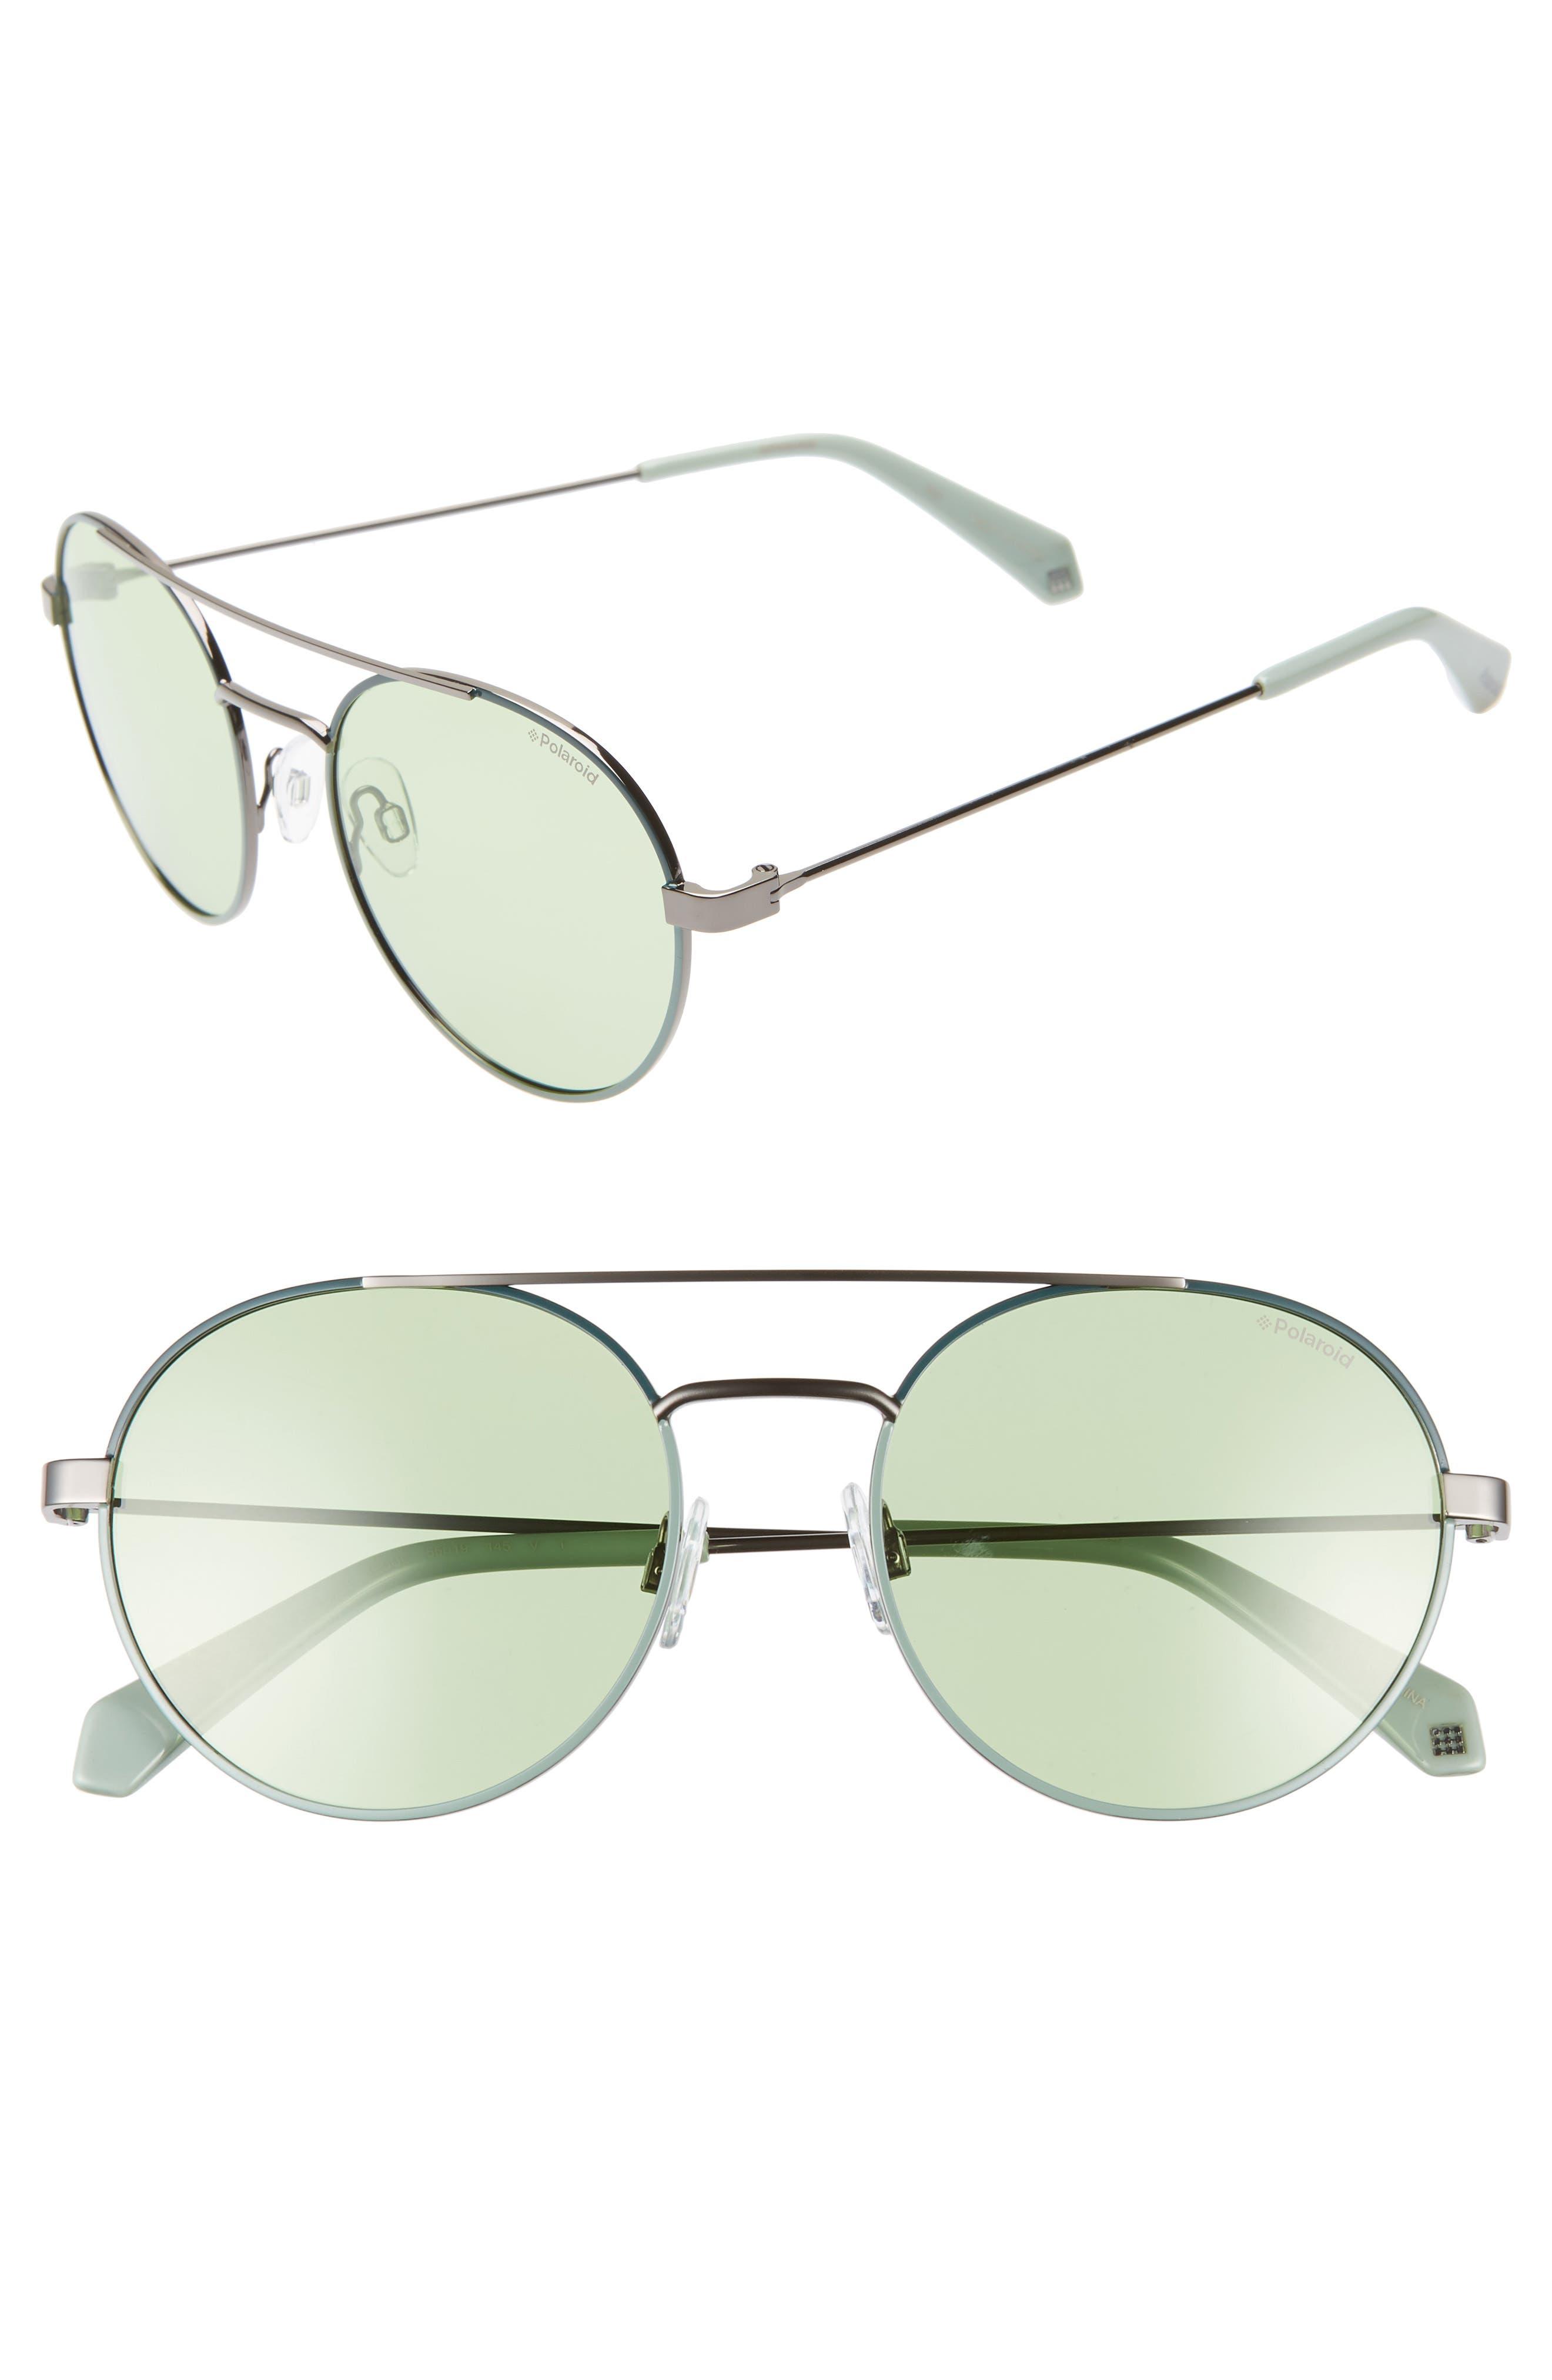 Polaroid 55Mm Polarized Round Aviator Sunglasses - Green/ Silver